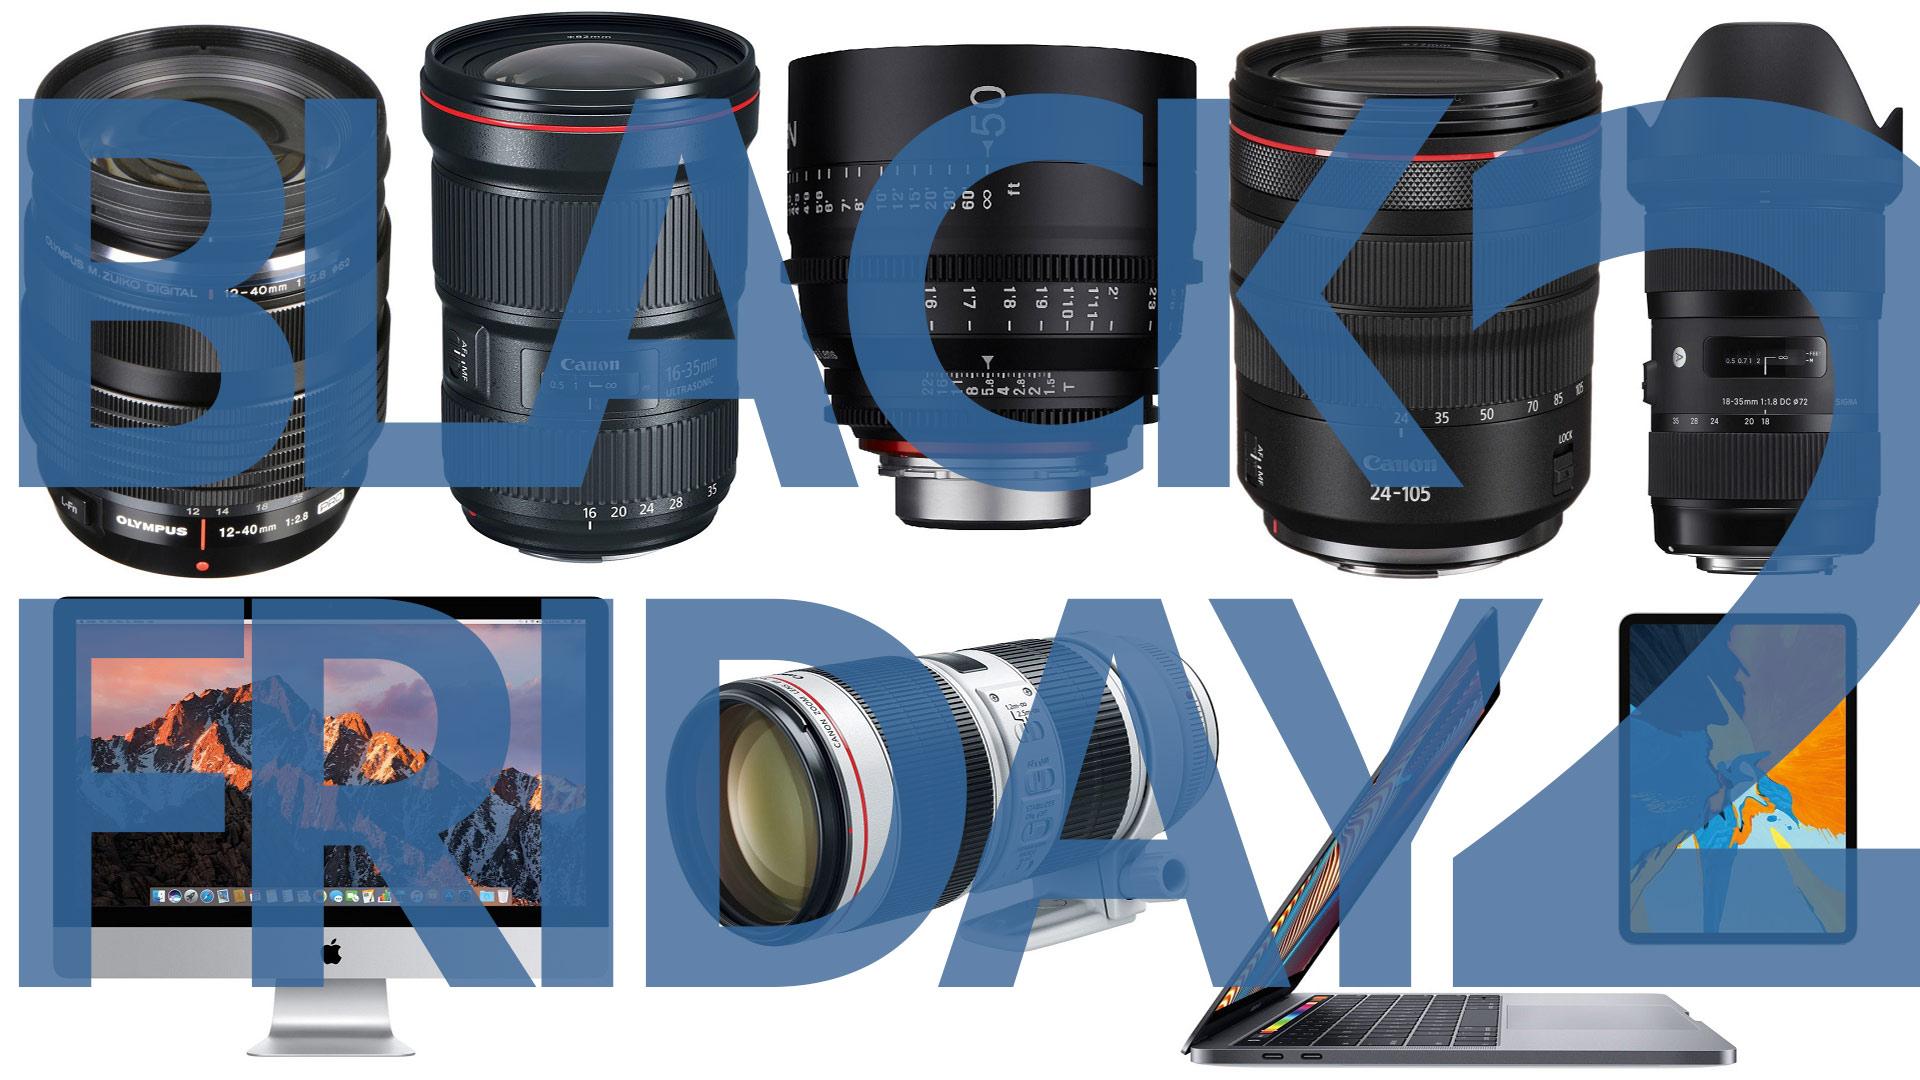 Las mejores ofertas de Black Friday para cineastas - Parte 2: lentes, computadoras, laptops, tablets